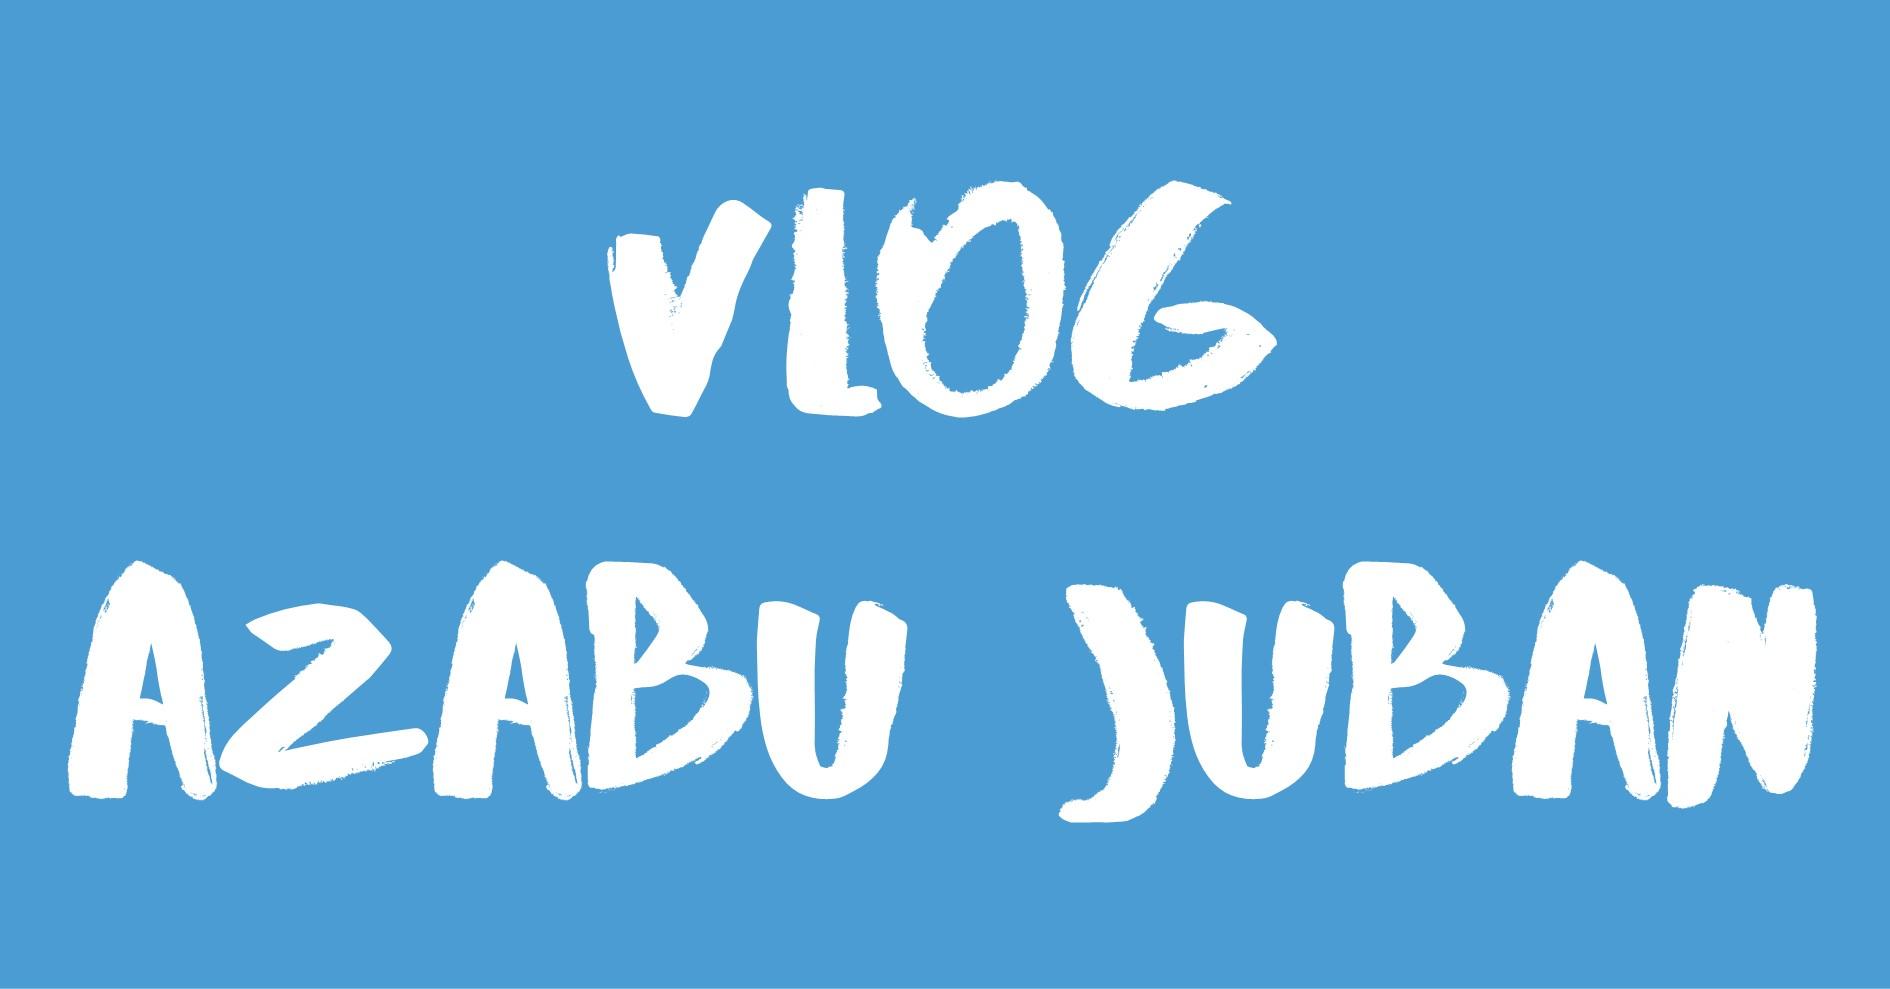 [Vlog] 麻布十番 / Azabu Juban